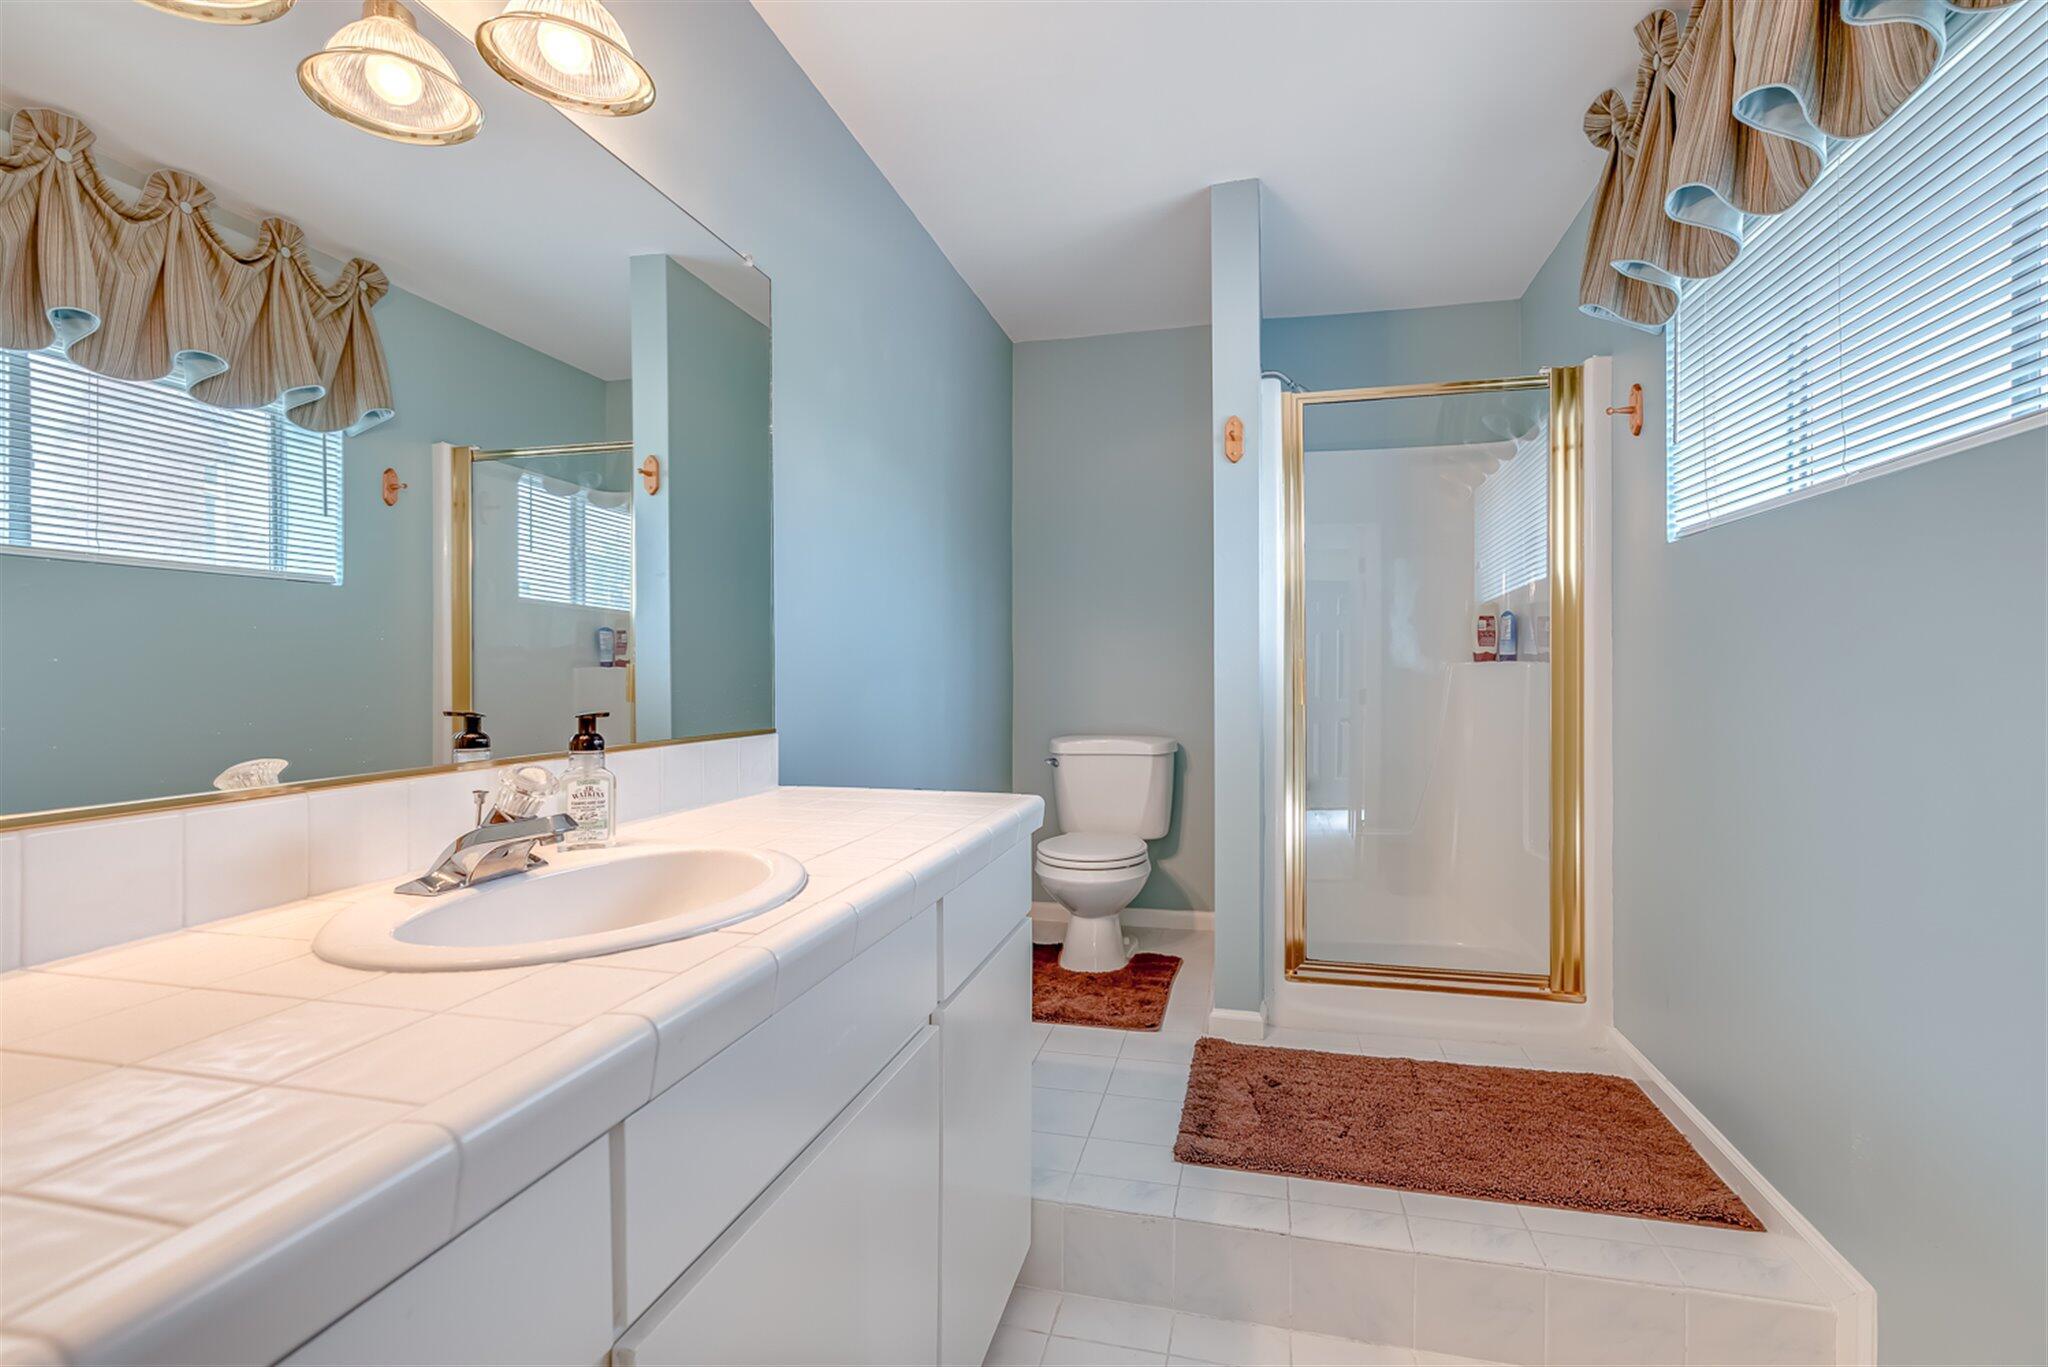 Indigo Point Homes For Sale - 50 Indigo Point, Charleston, SC - 6